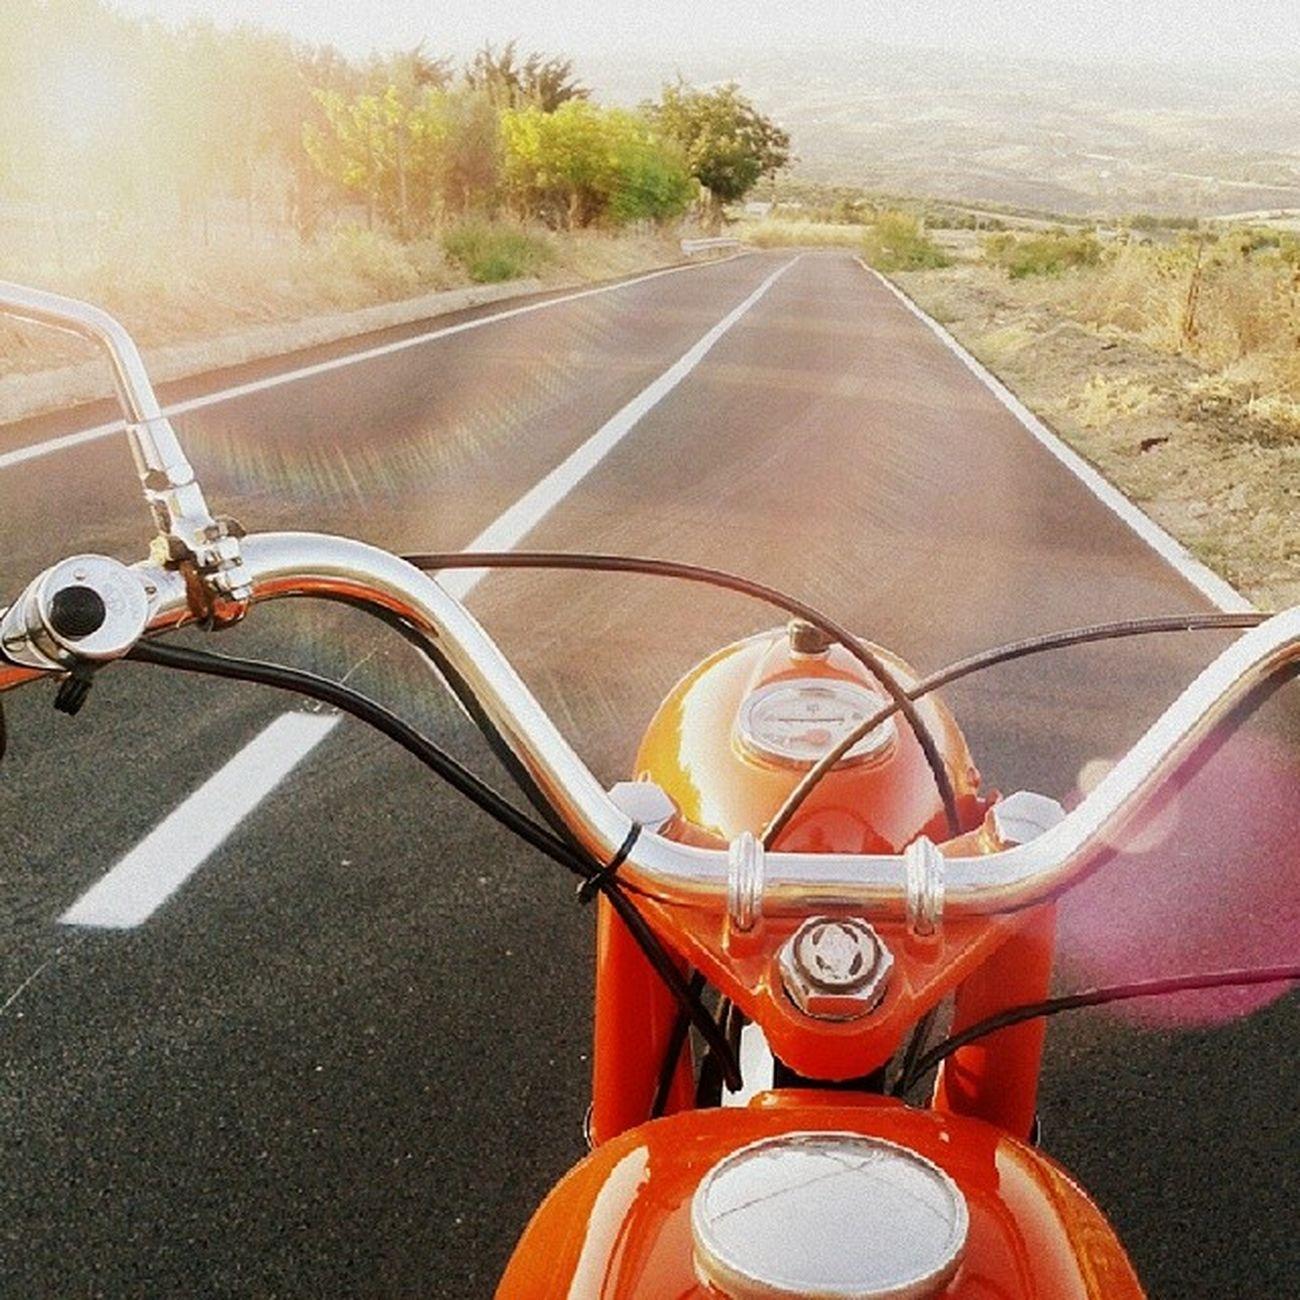 Gilera 125  Gilera125 Epoca moto motoepoca motodepoca motocicletta motociclettadepoca motorcicle vintage vintagemorcicle sicilia sicily montaperto agrigento strada street